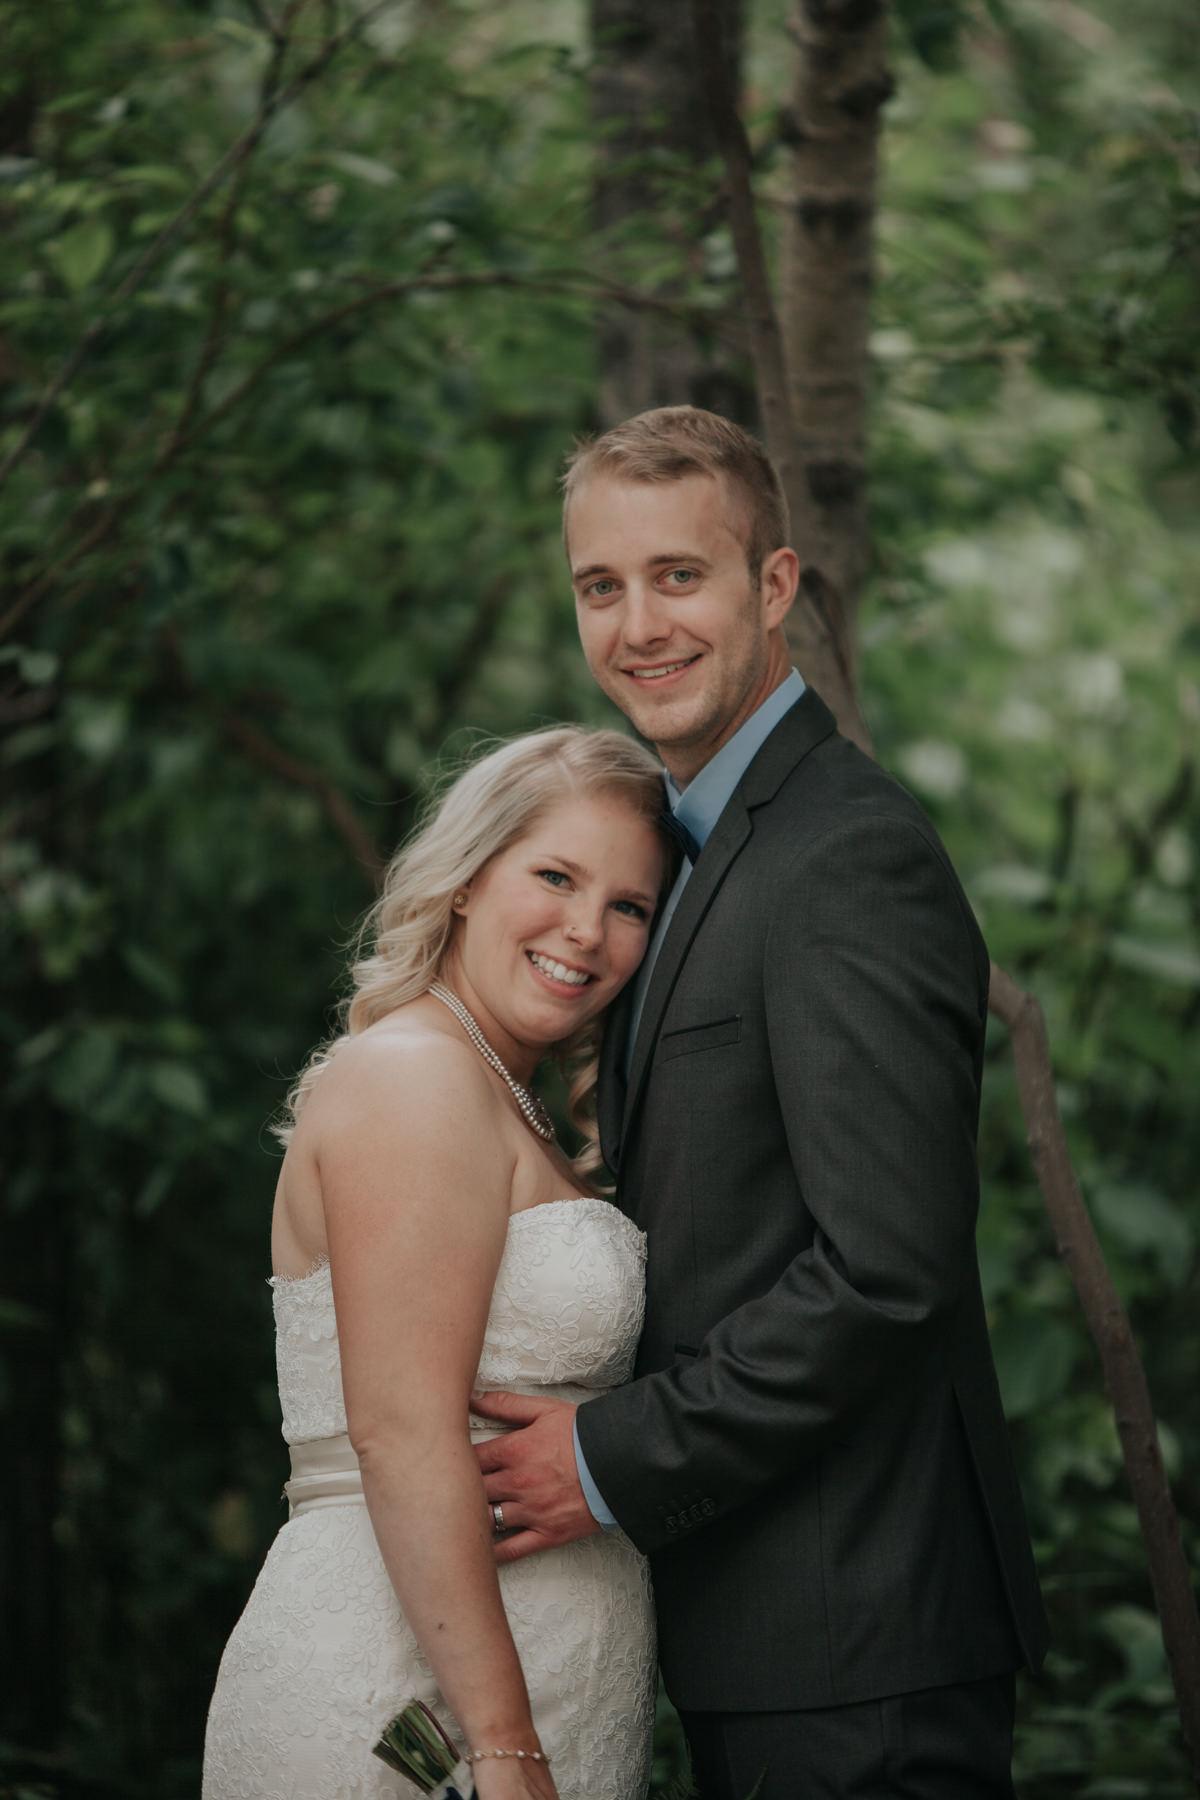 Vancouver wedding photographer Jess 46